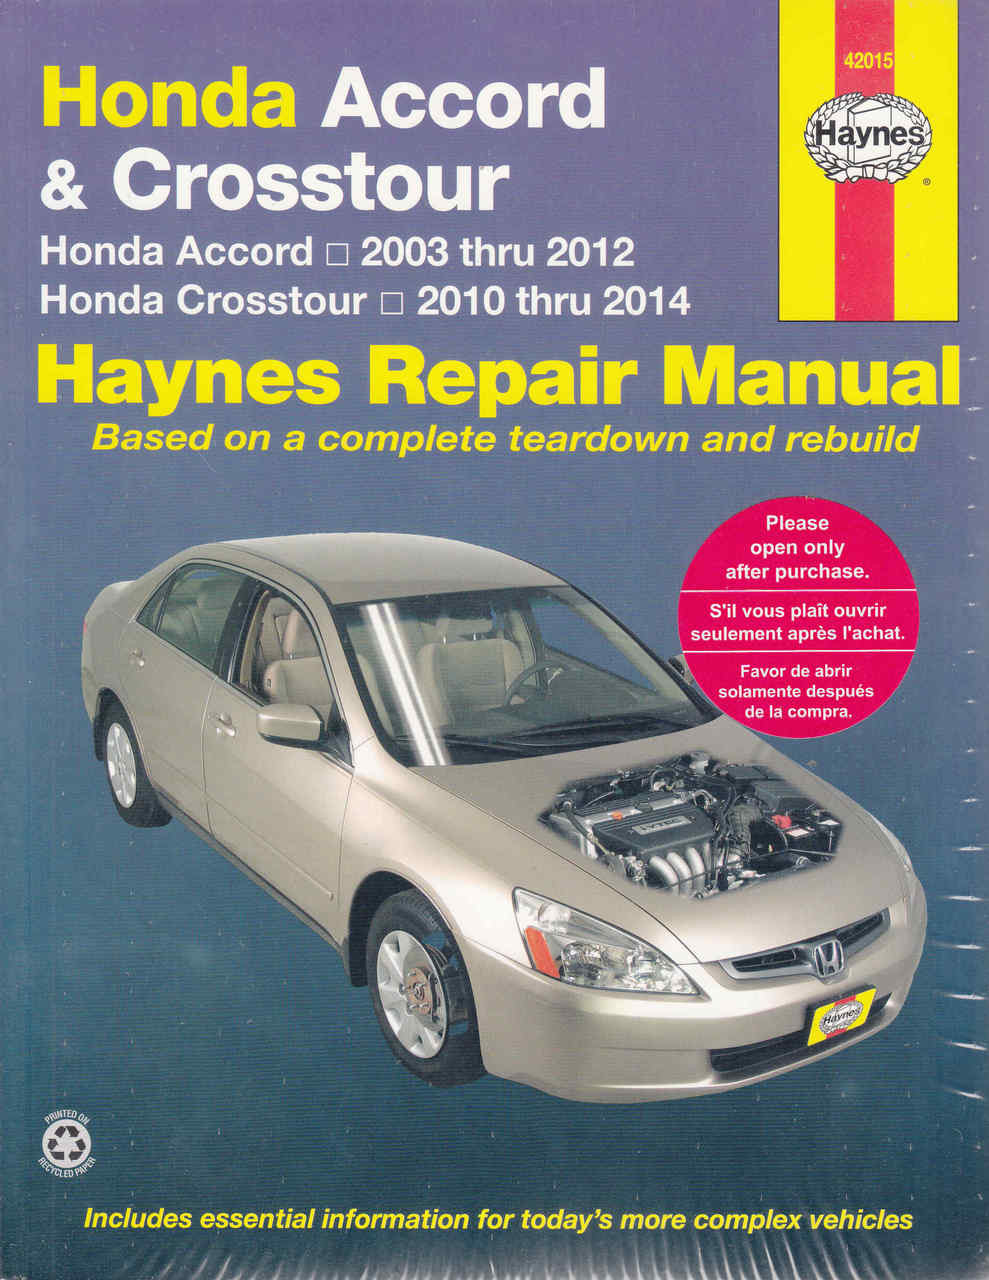 honda accord crosstour 2003 2012 workshop manual rh automotobookshop com au 2018 Honda Accord Manual Transmission honda accord 2008 service manual pdf